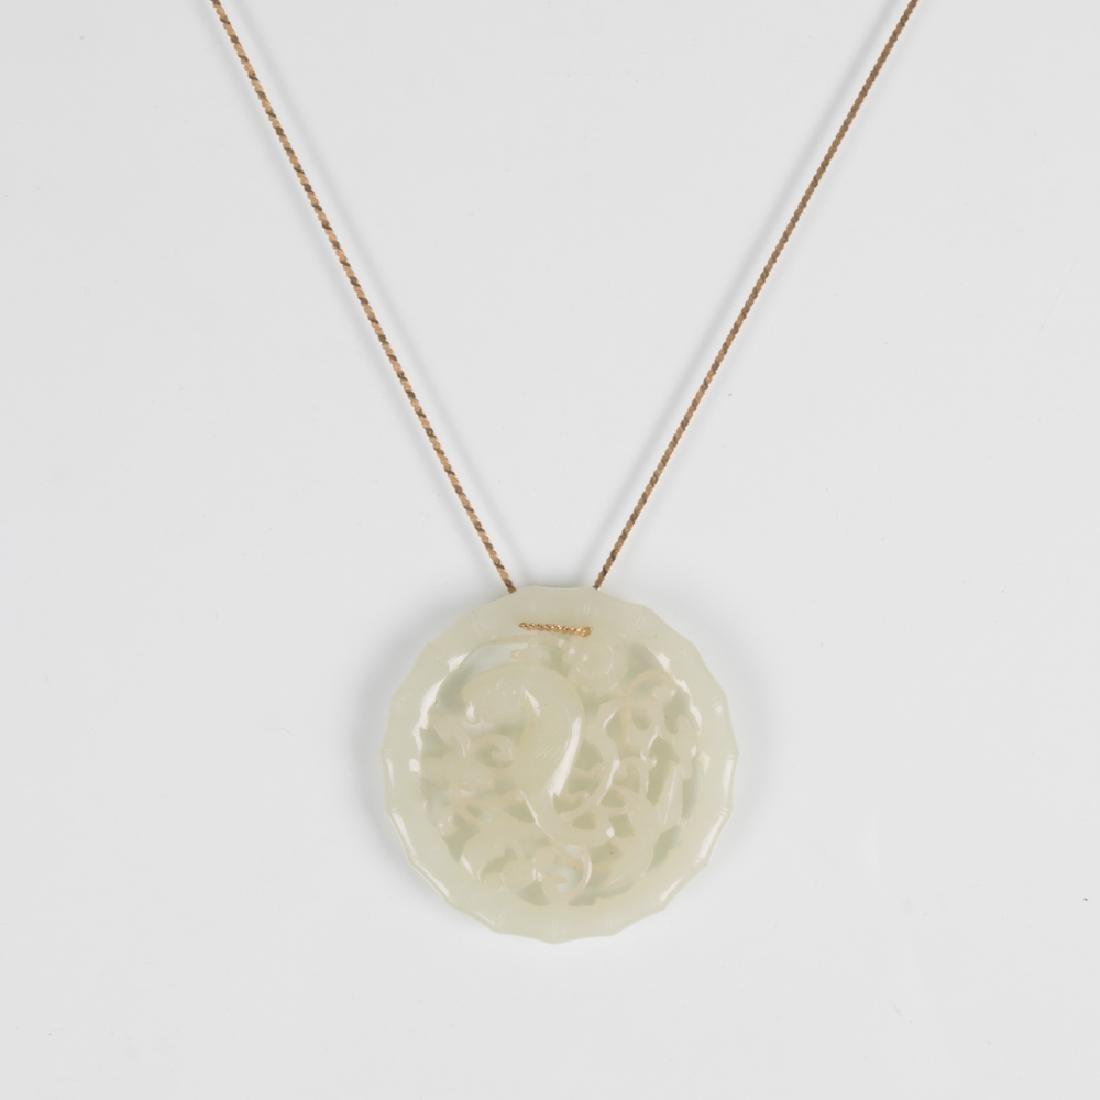 A Pierced Carved White Jade Pendant,